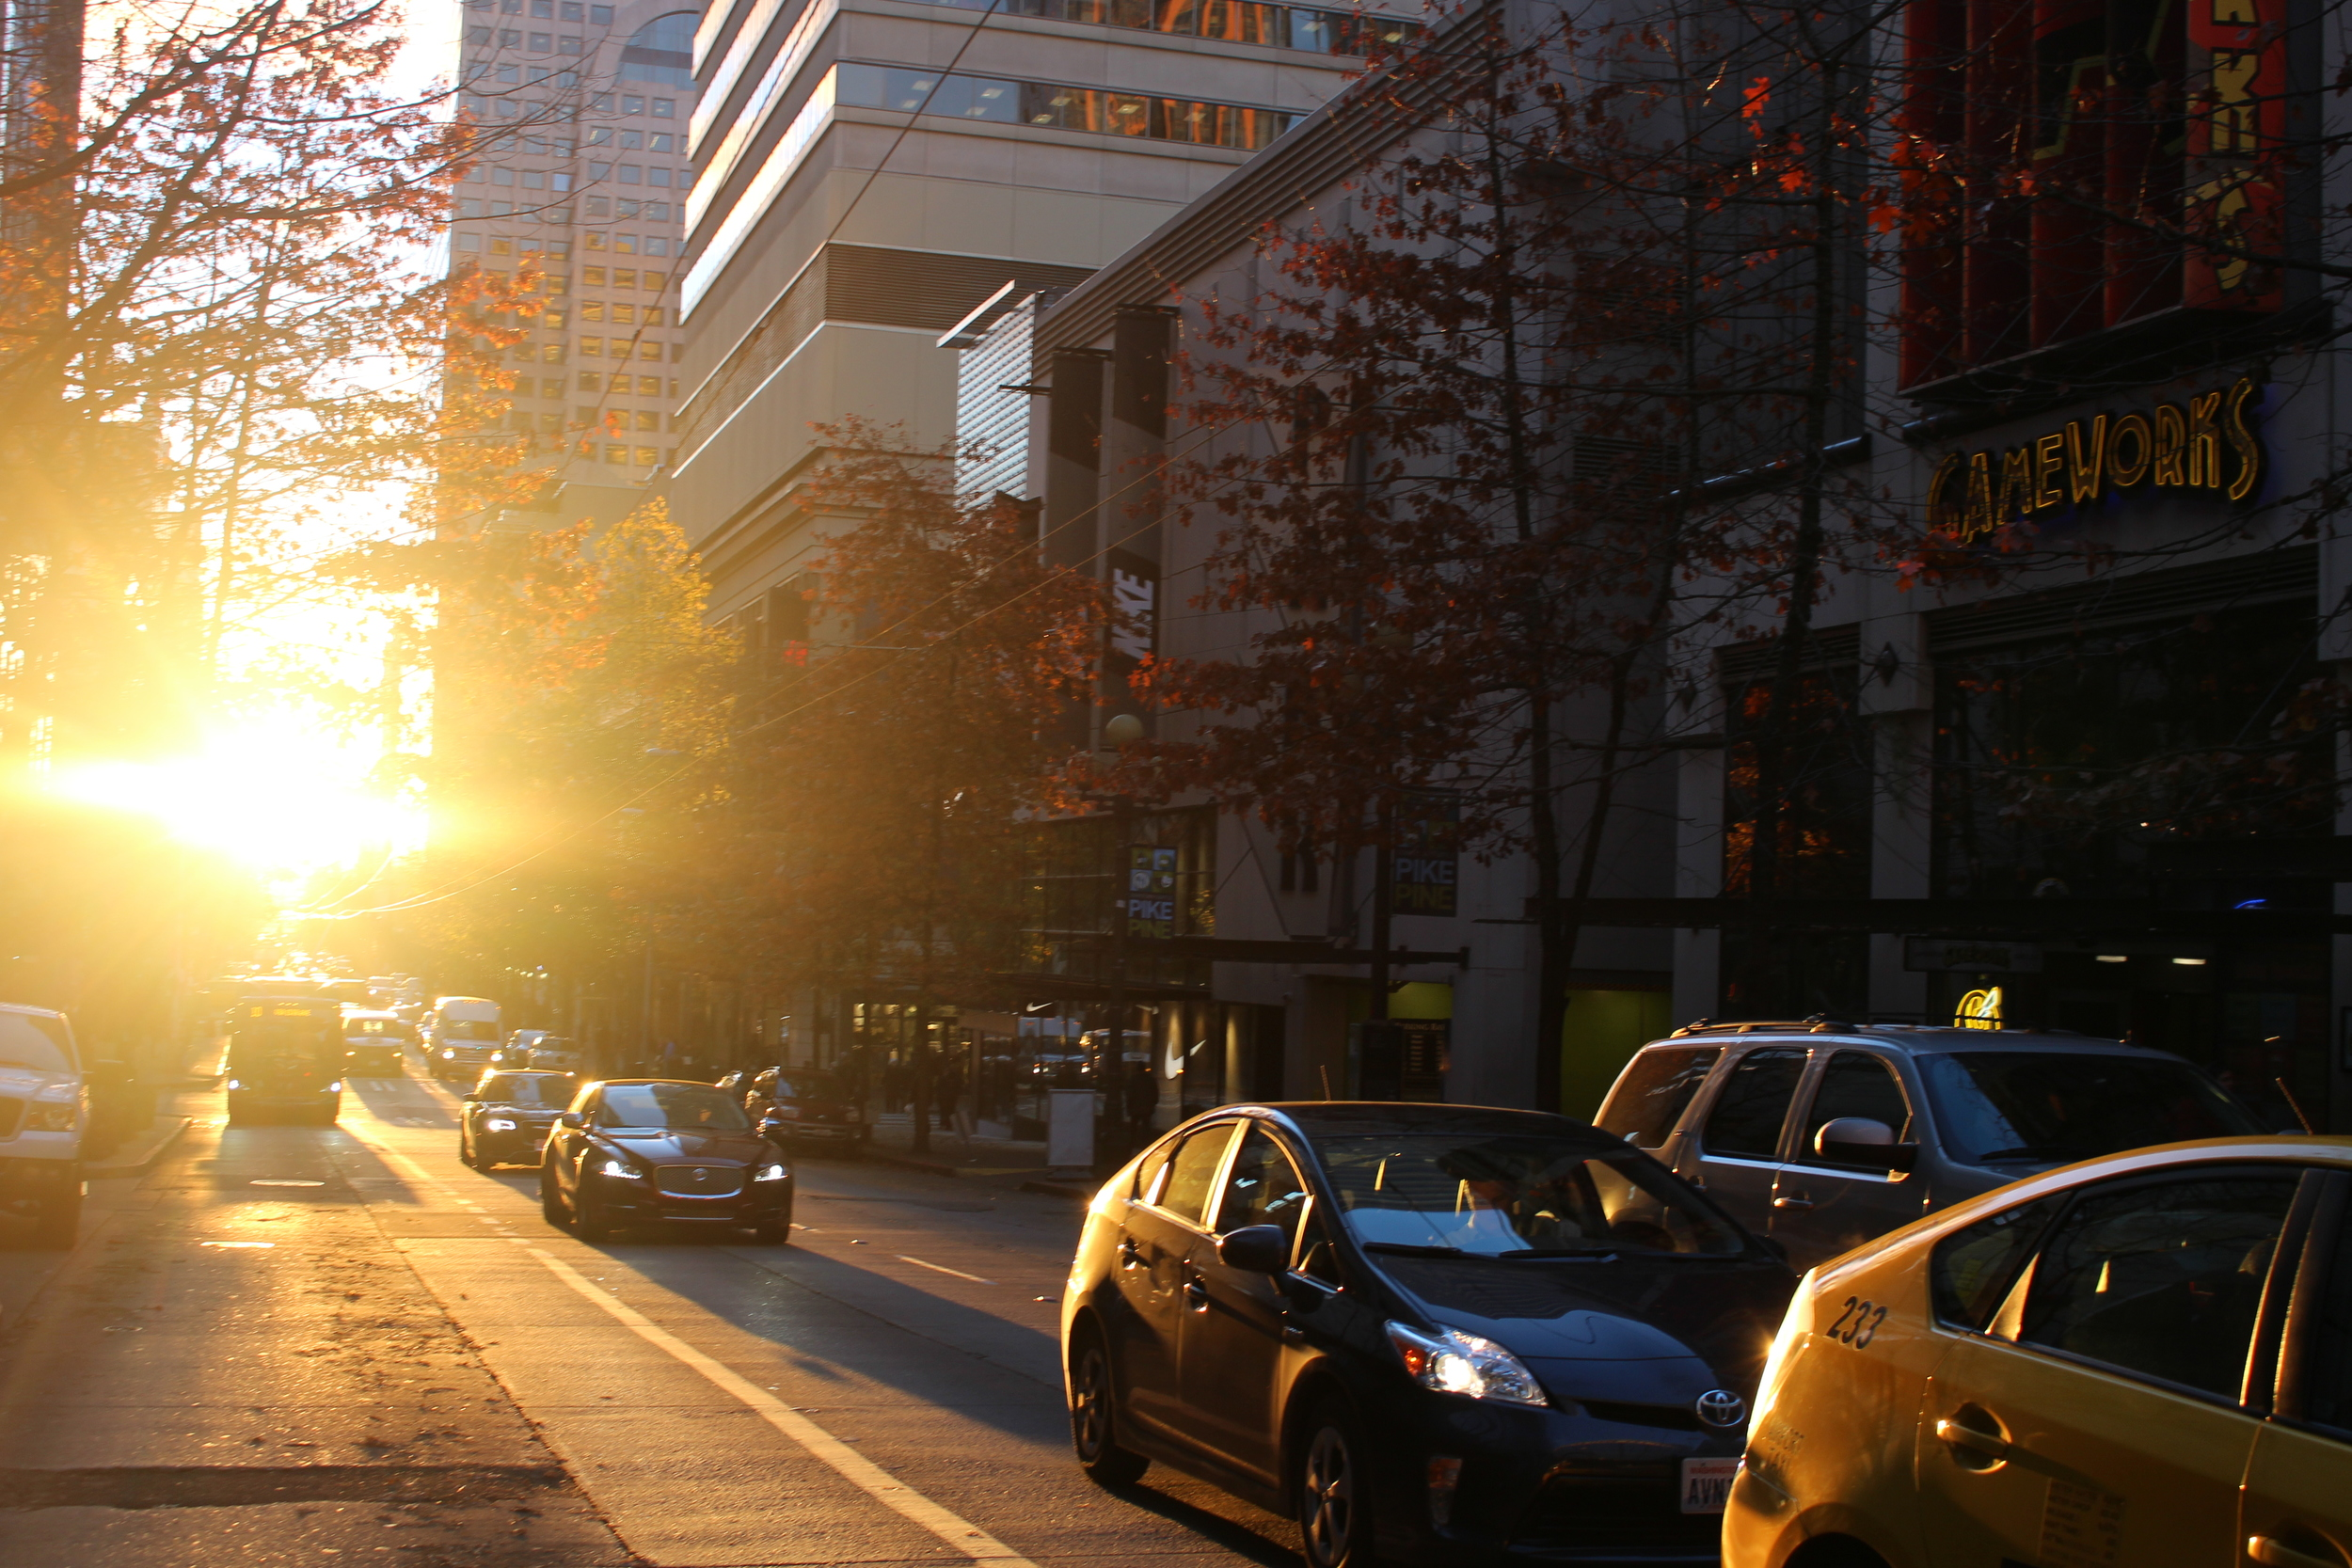 @Downtown Seattle